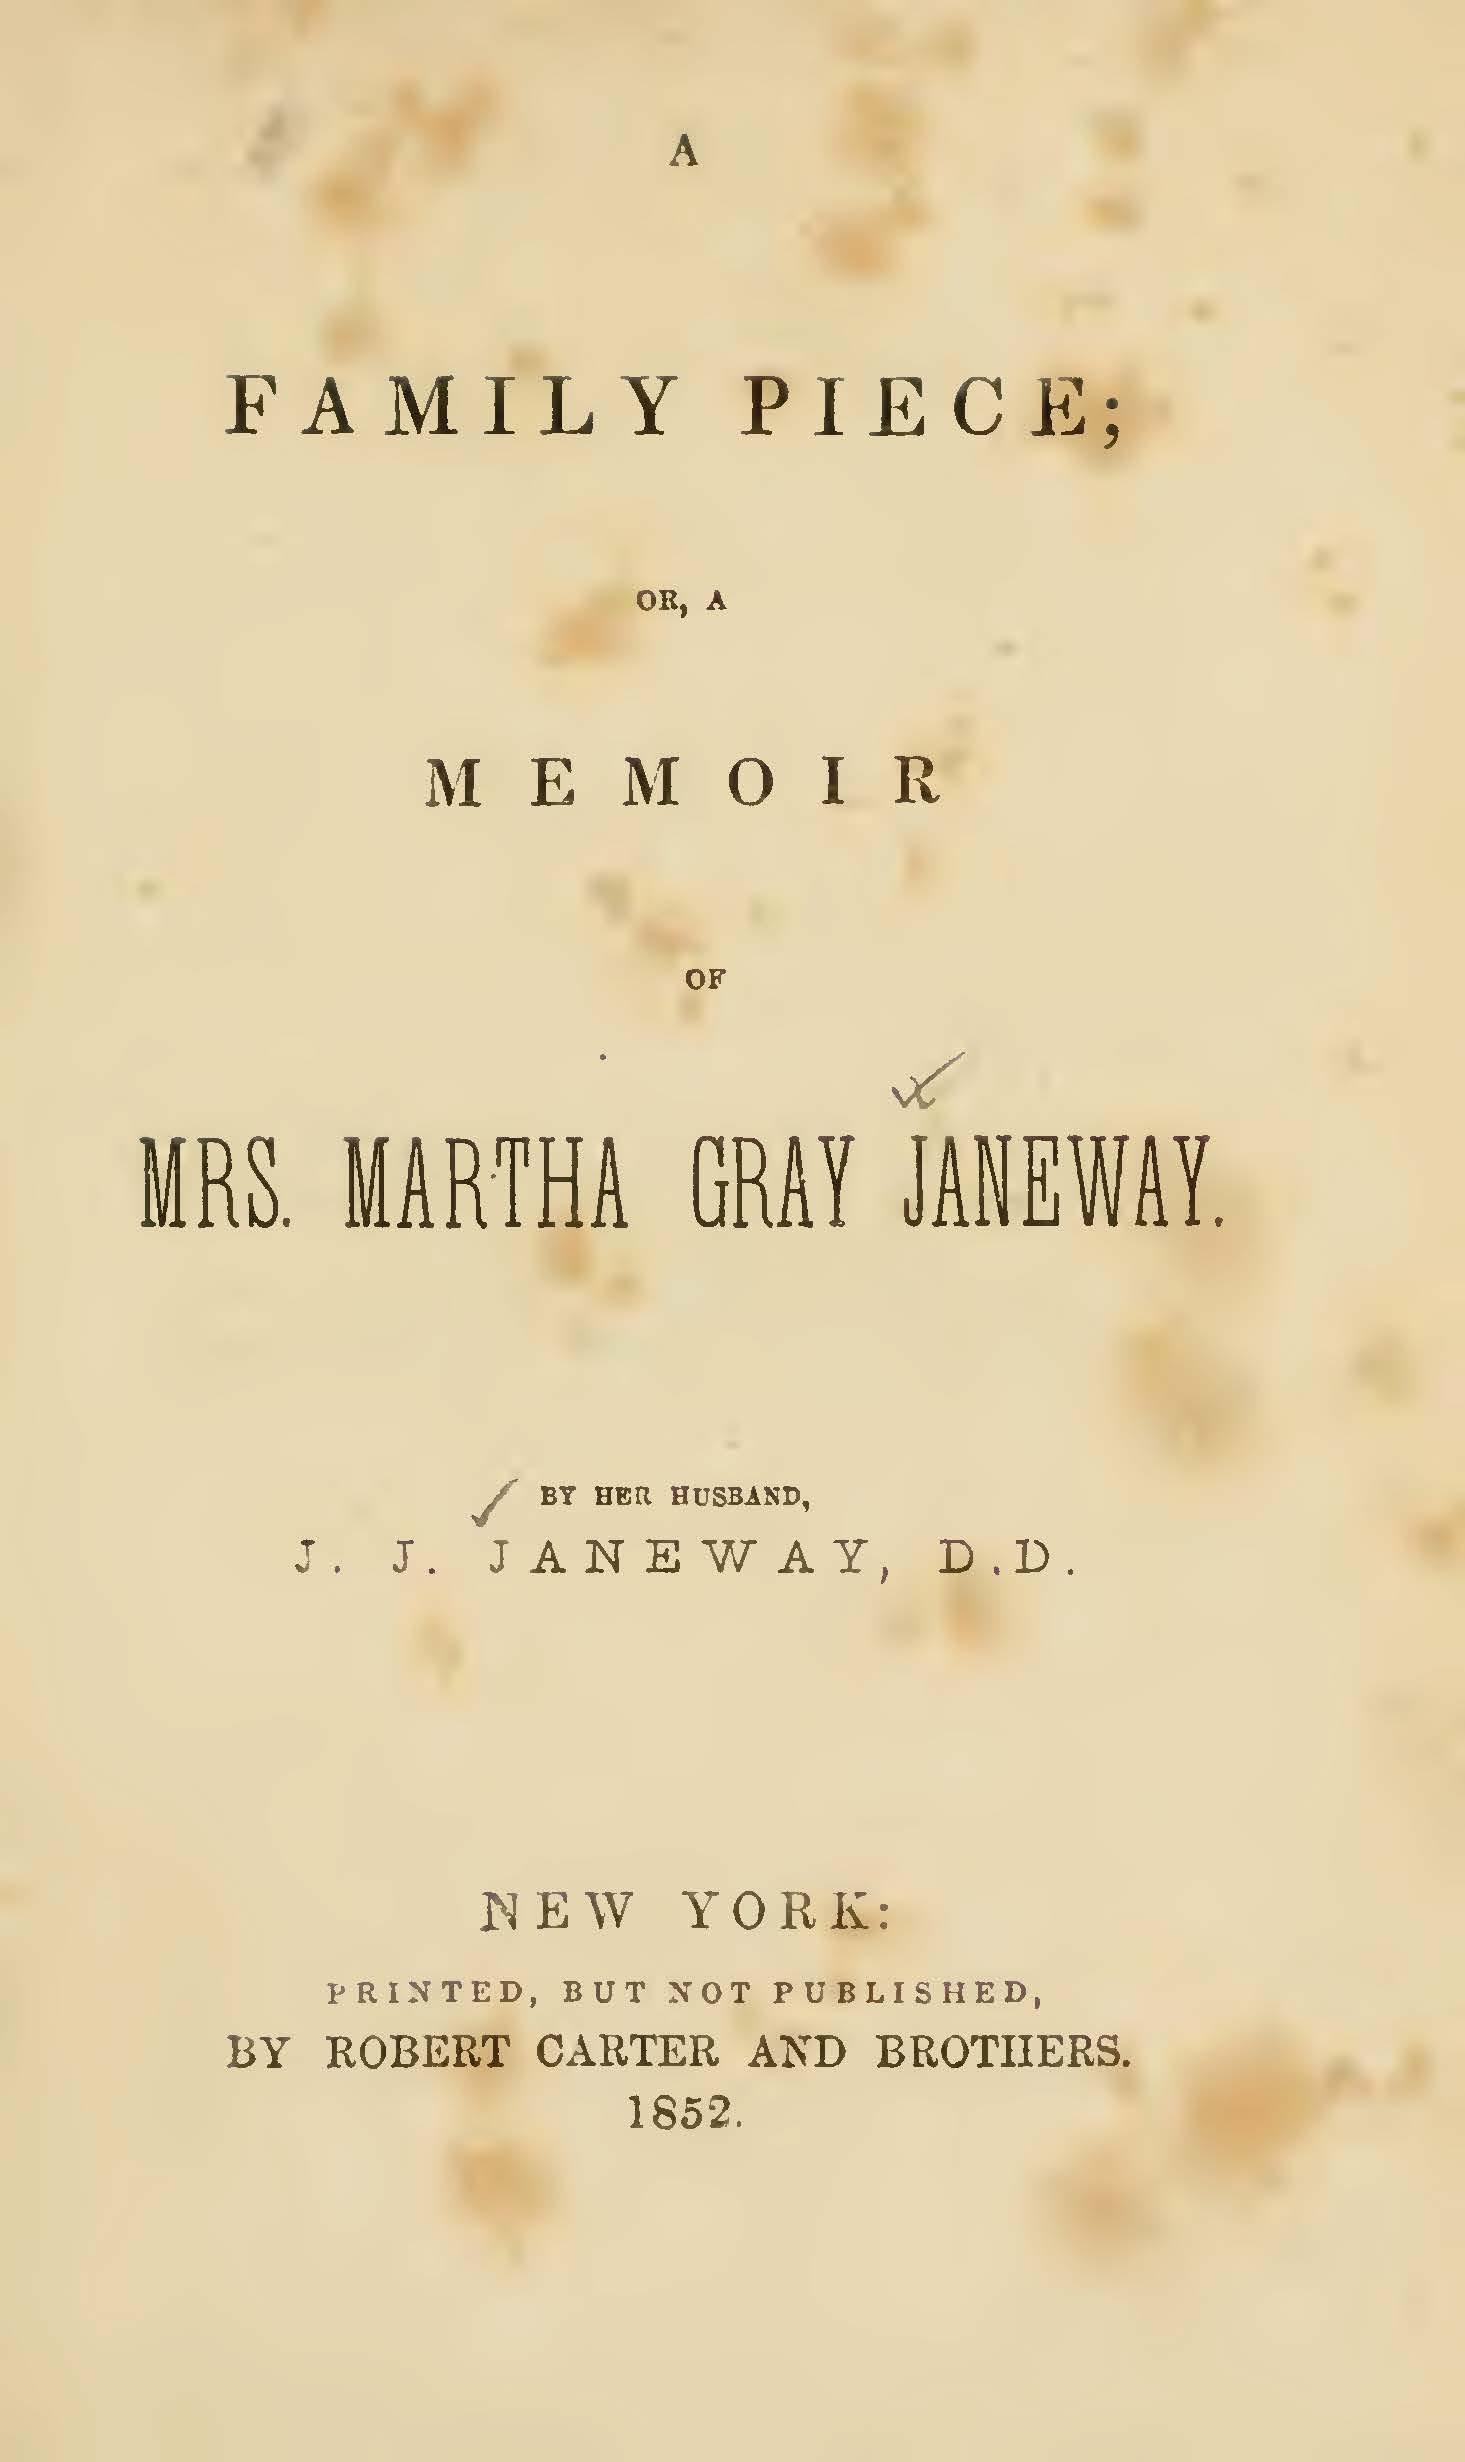 Janeway, Jacob Jones, A Family Piece Title Page.jpg